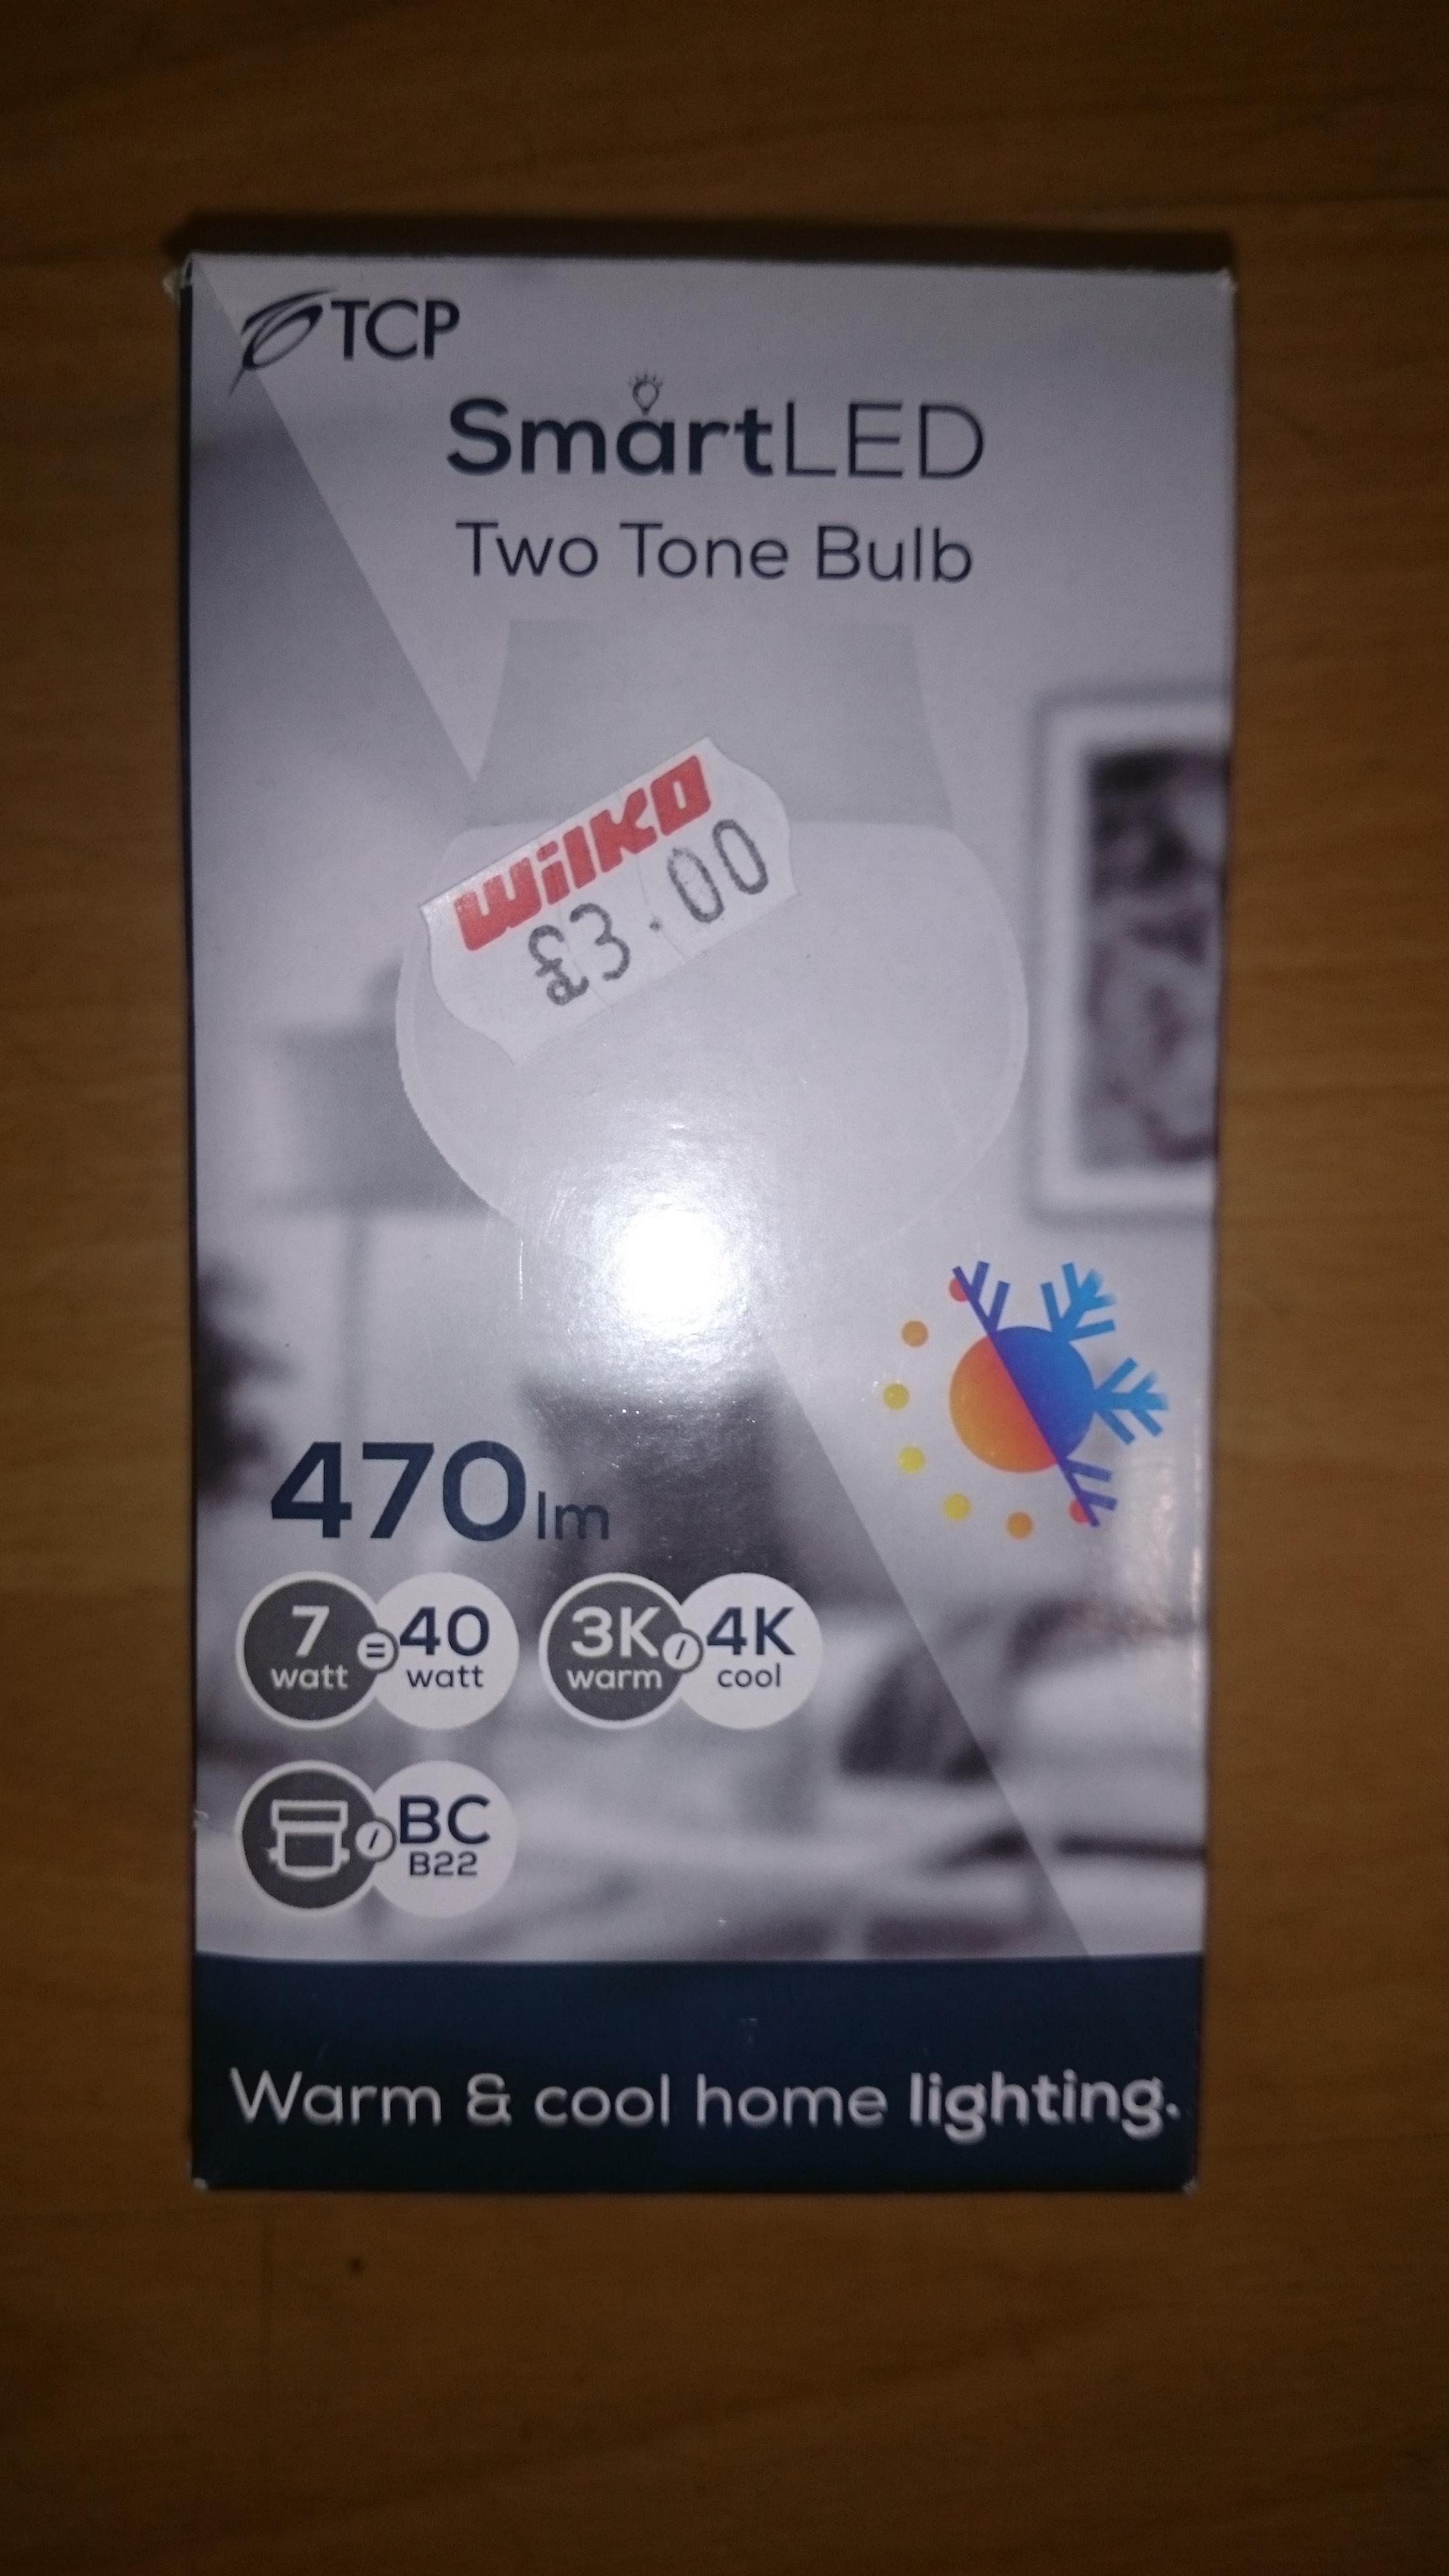 TCP Smart LED Two Tone Bulb £1 instore @ Wilko